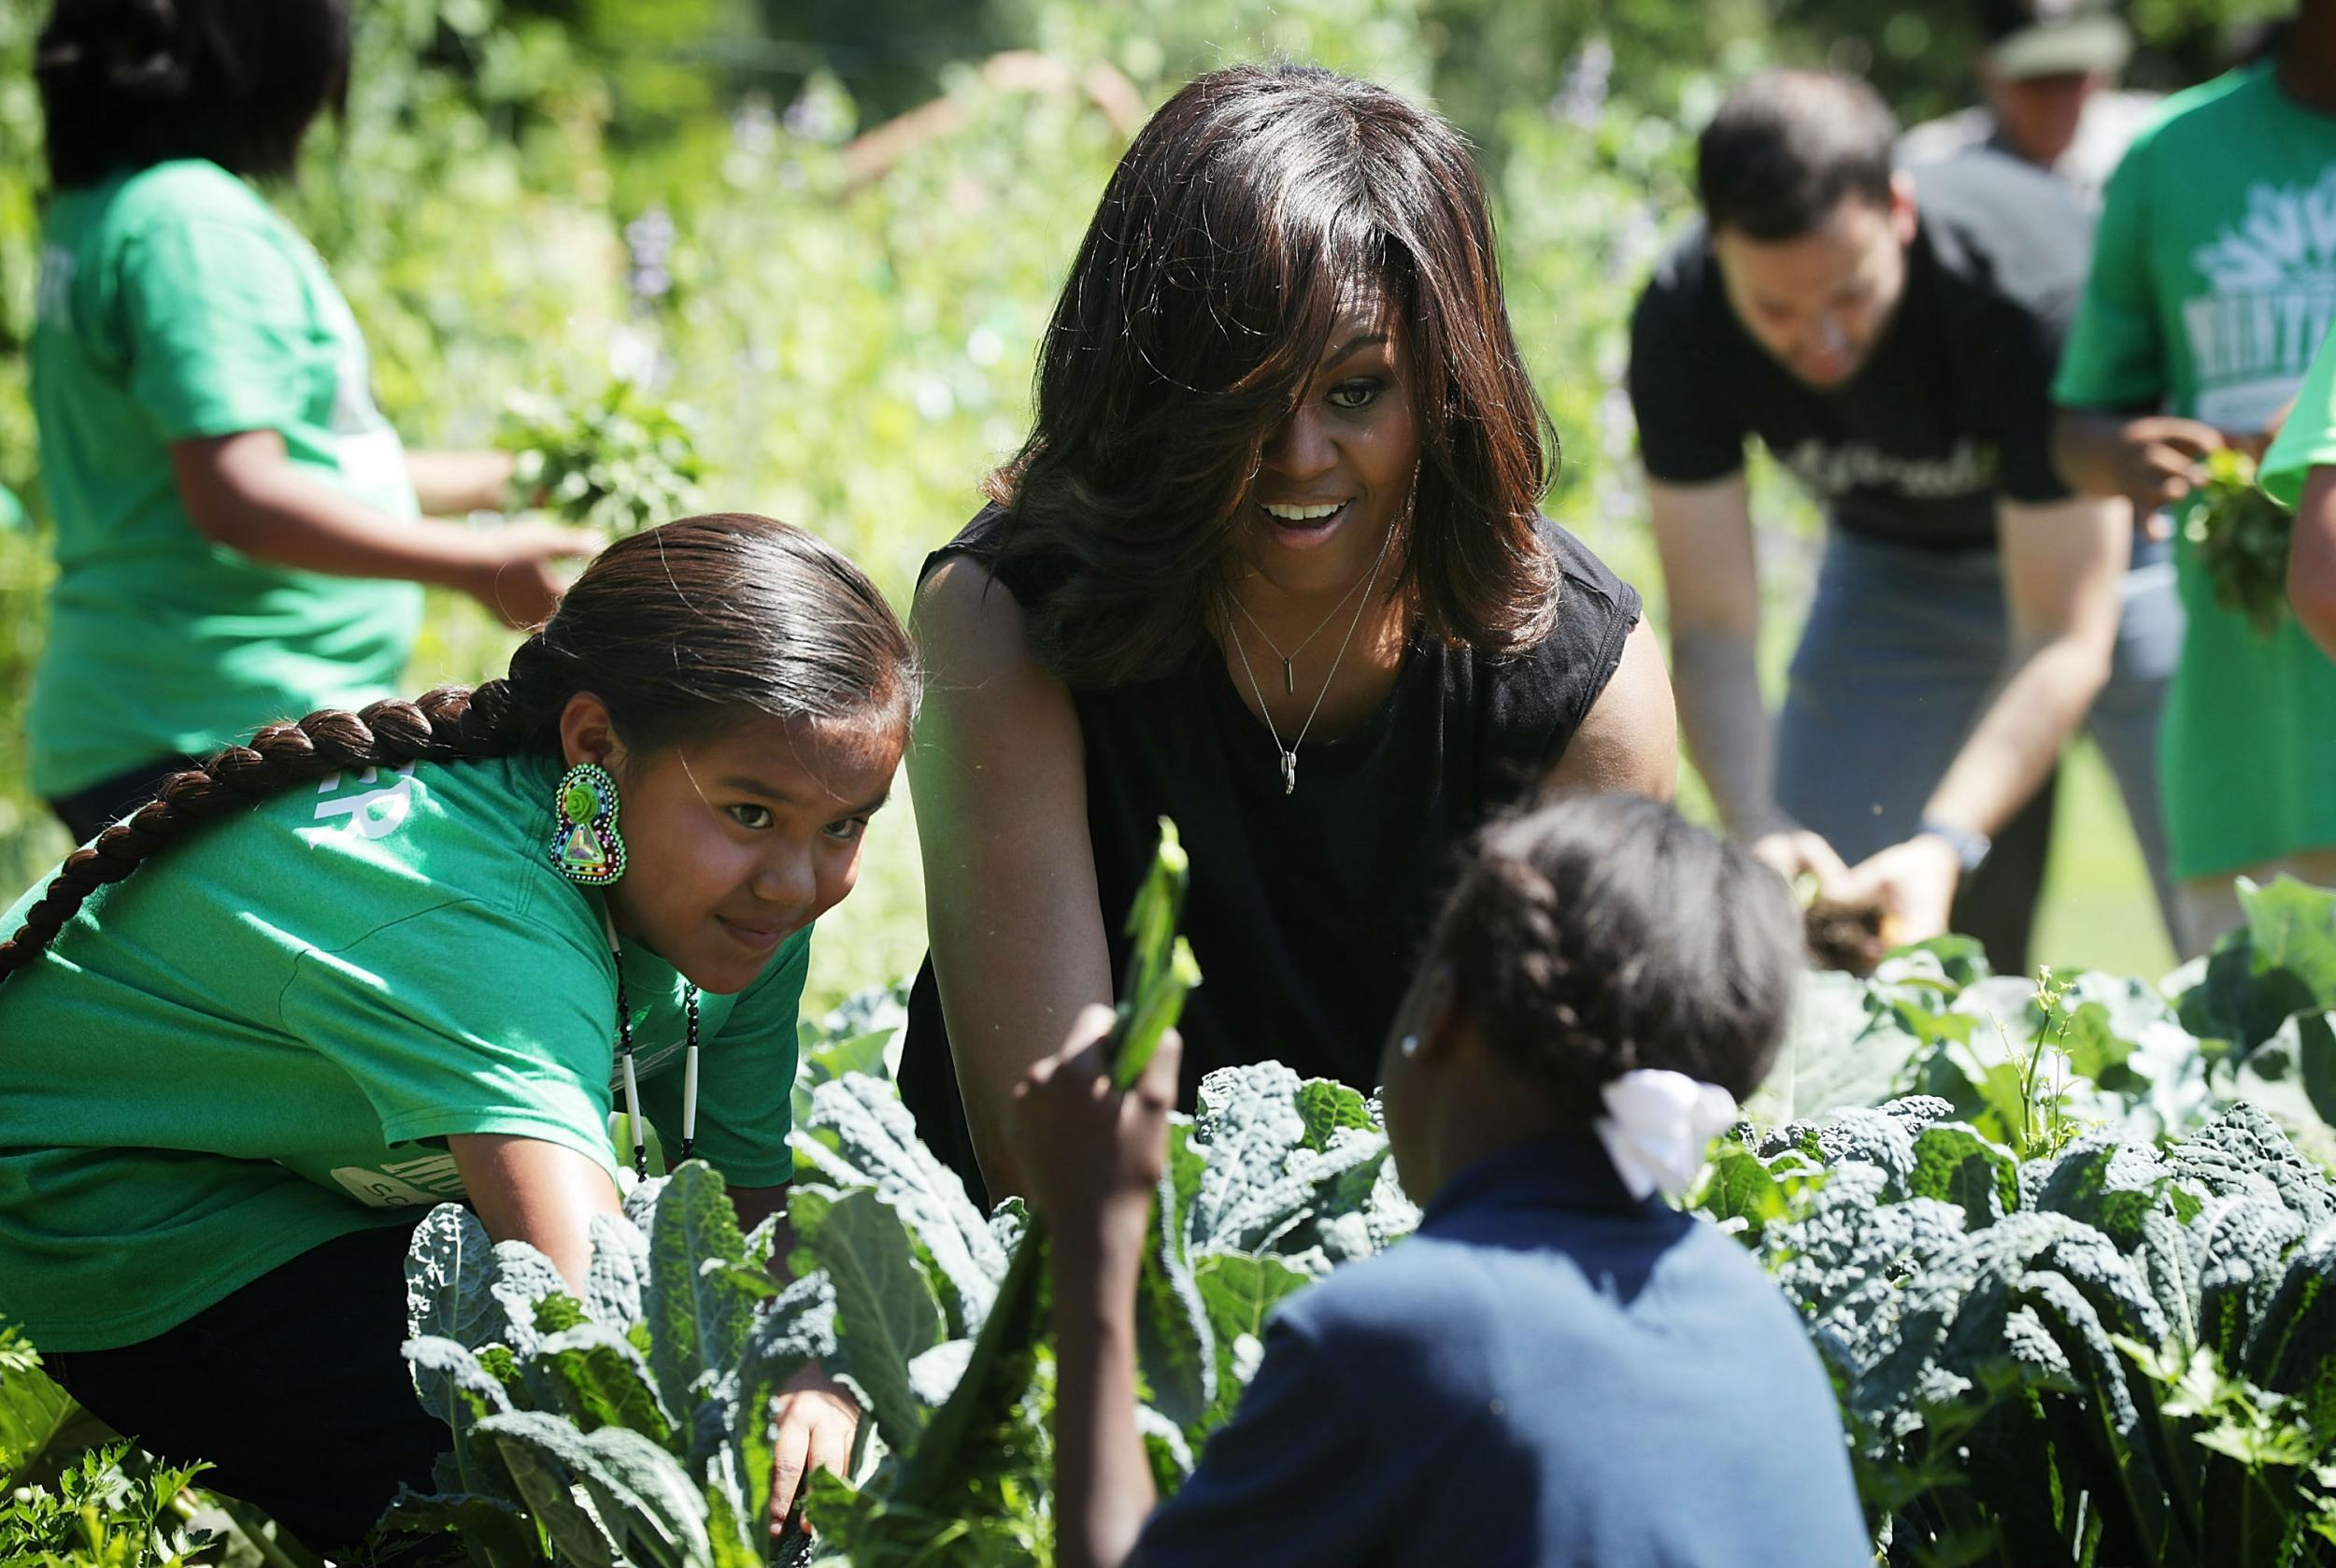 Michelle Obama Preserves White House Kitchen Garden In Stone And Says She Hopes Future